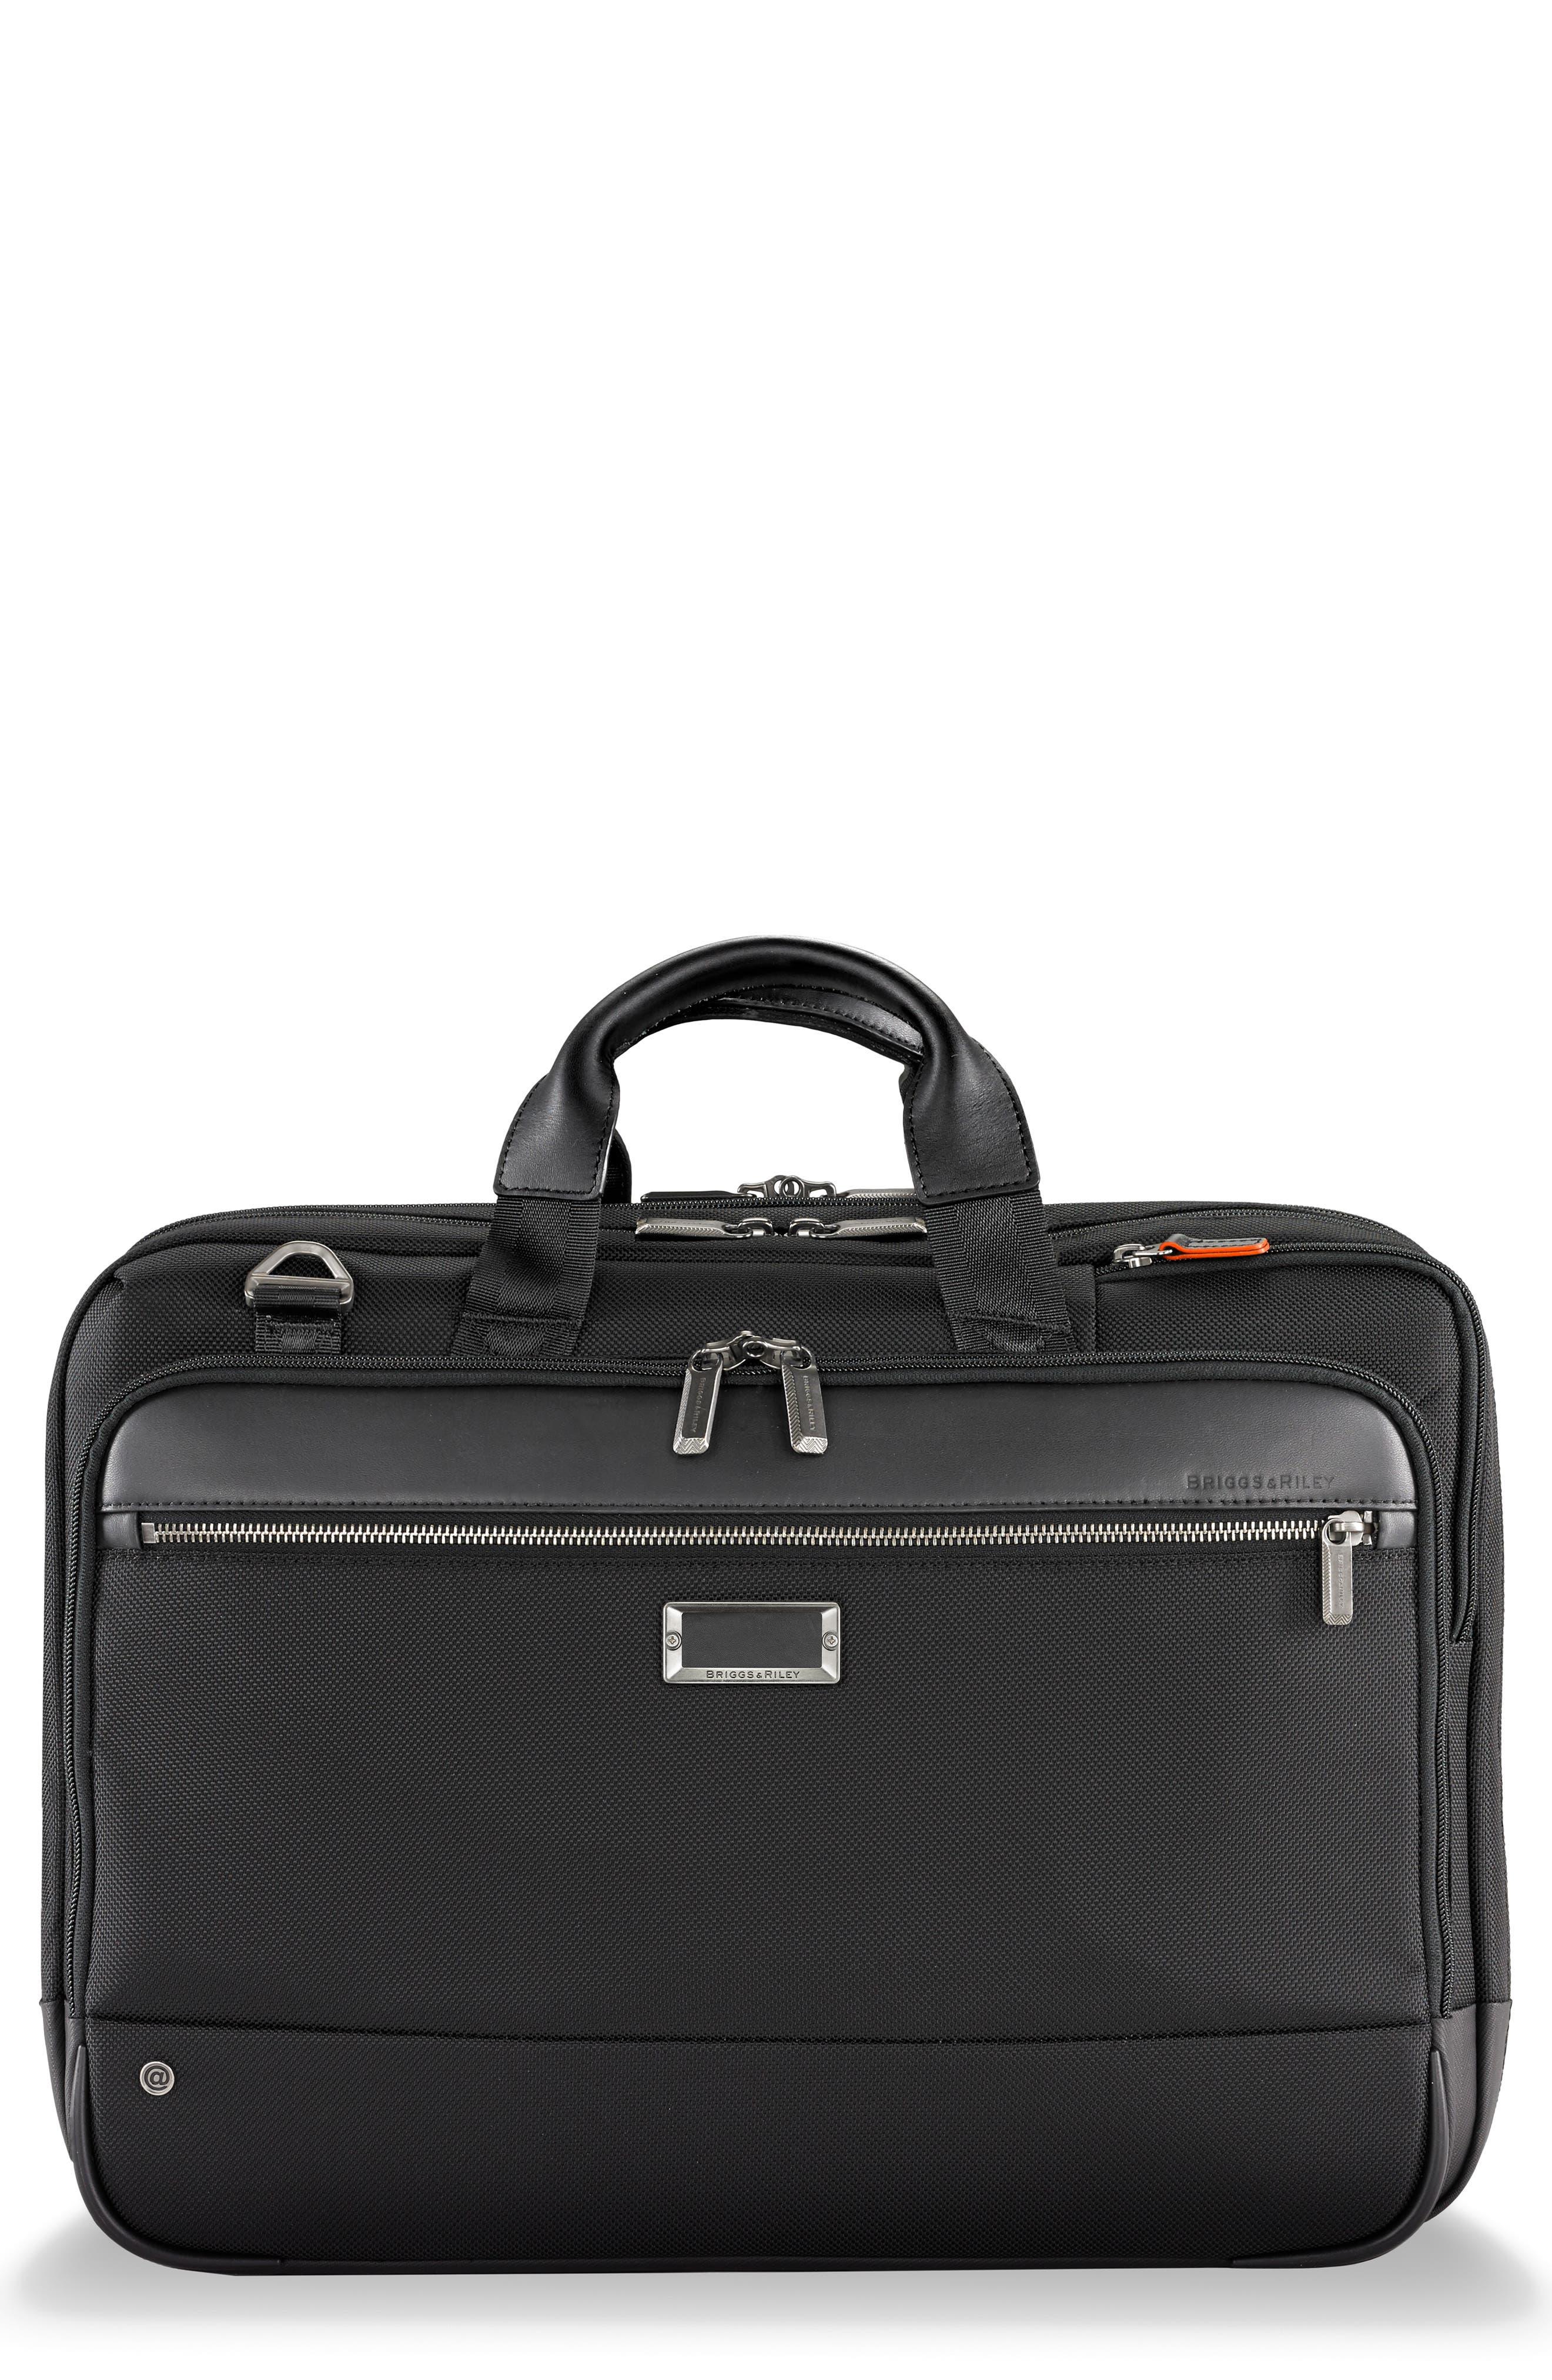 @work Large Expandable Ballistic Nylon Laptop Briefcase With Rfid Pocket